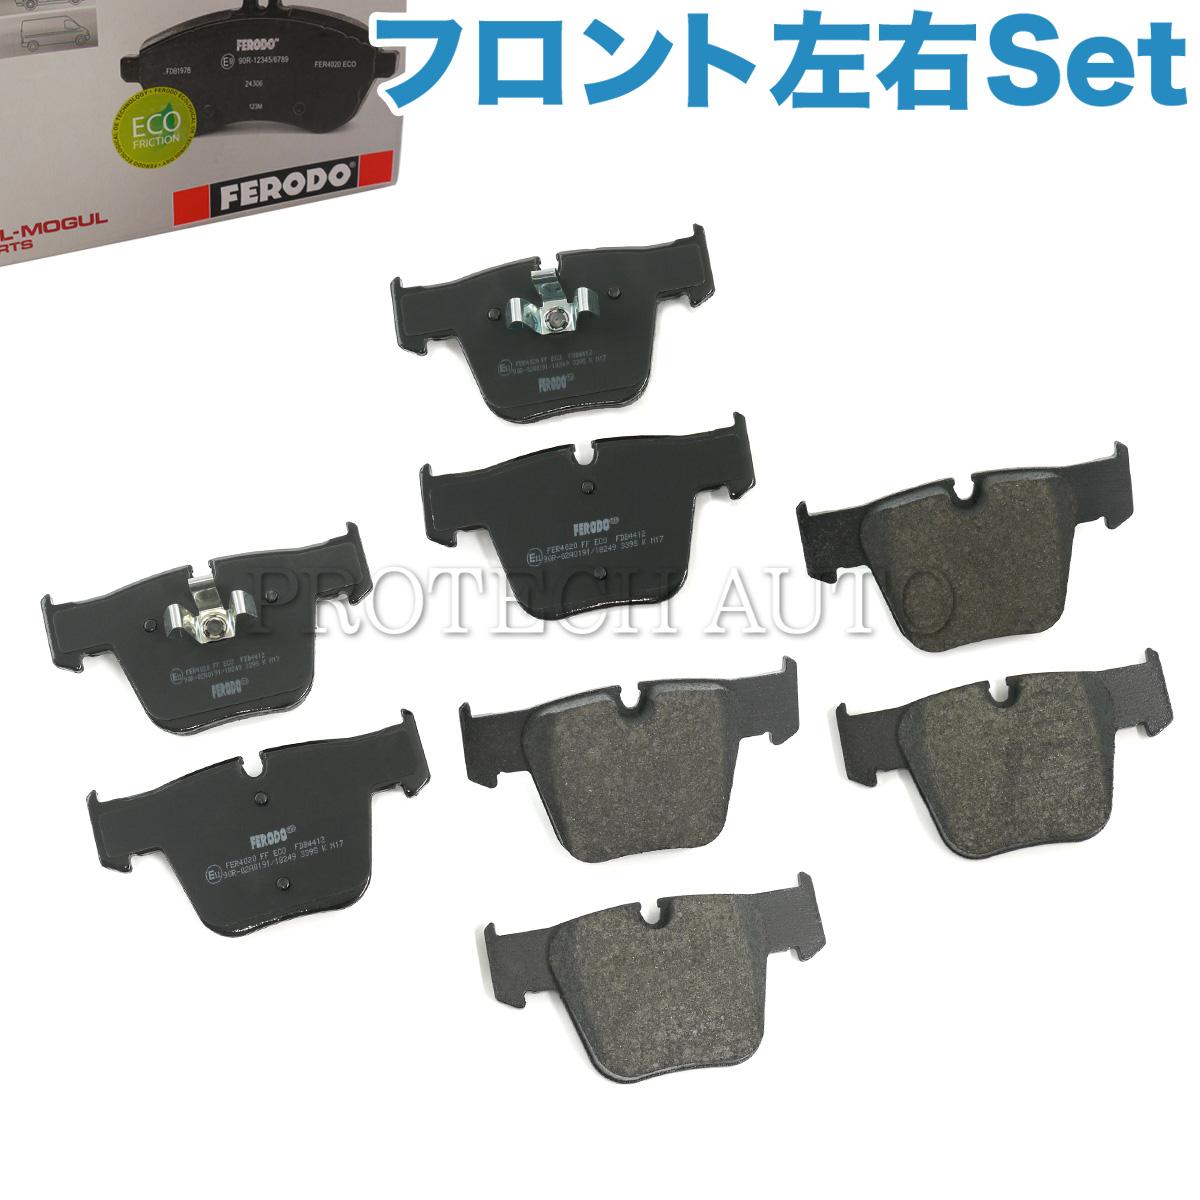 FERODO製 ベンツ W221 W216 S63AMG CL63AMG フロント ブレーキパッド/ディスクパッド 左右セット 0044207520 004420752041【あす楽対応】